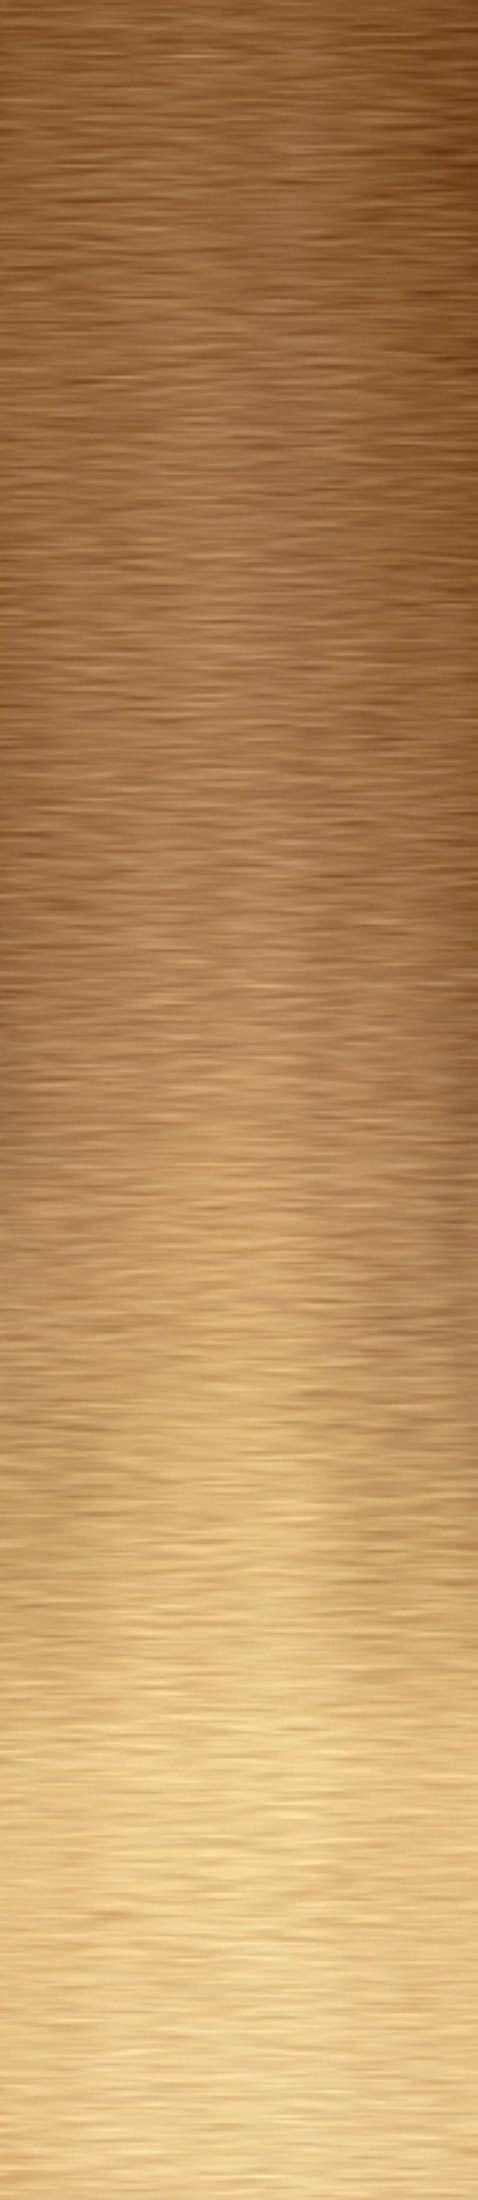 background-wood-pattern.jpg